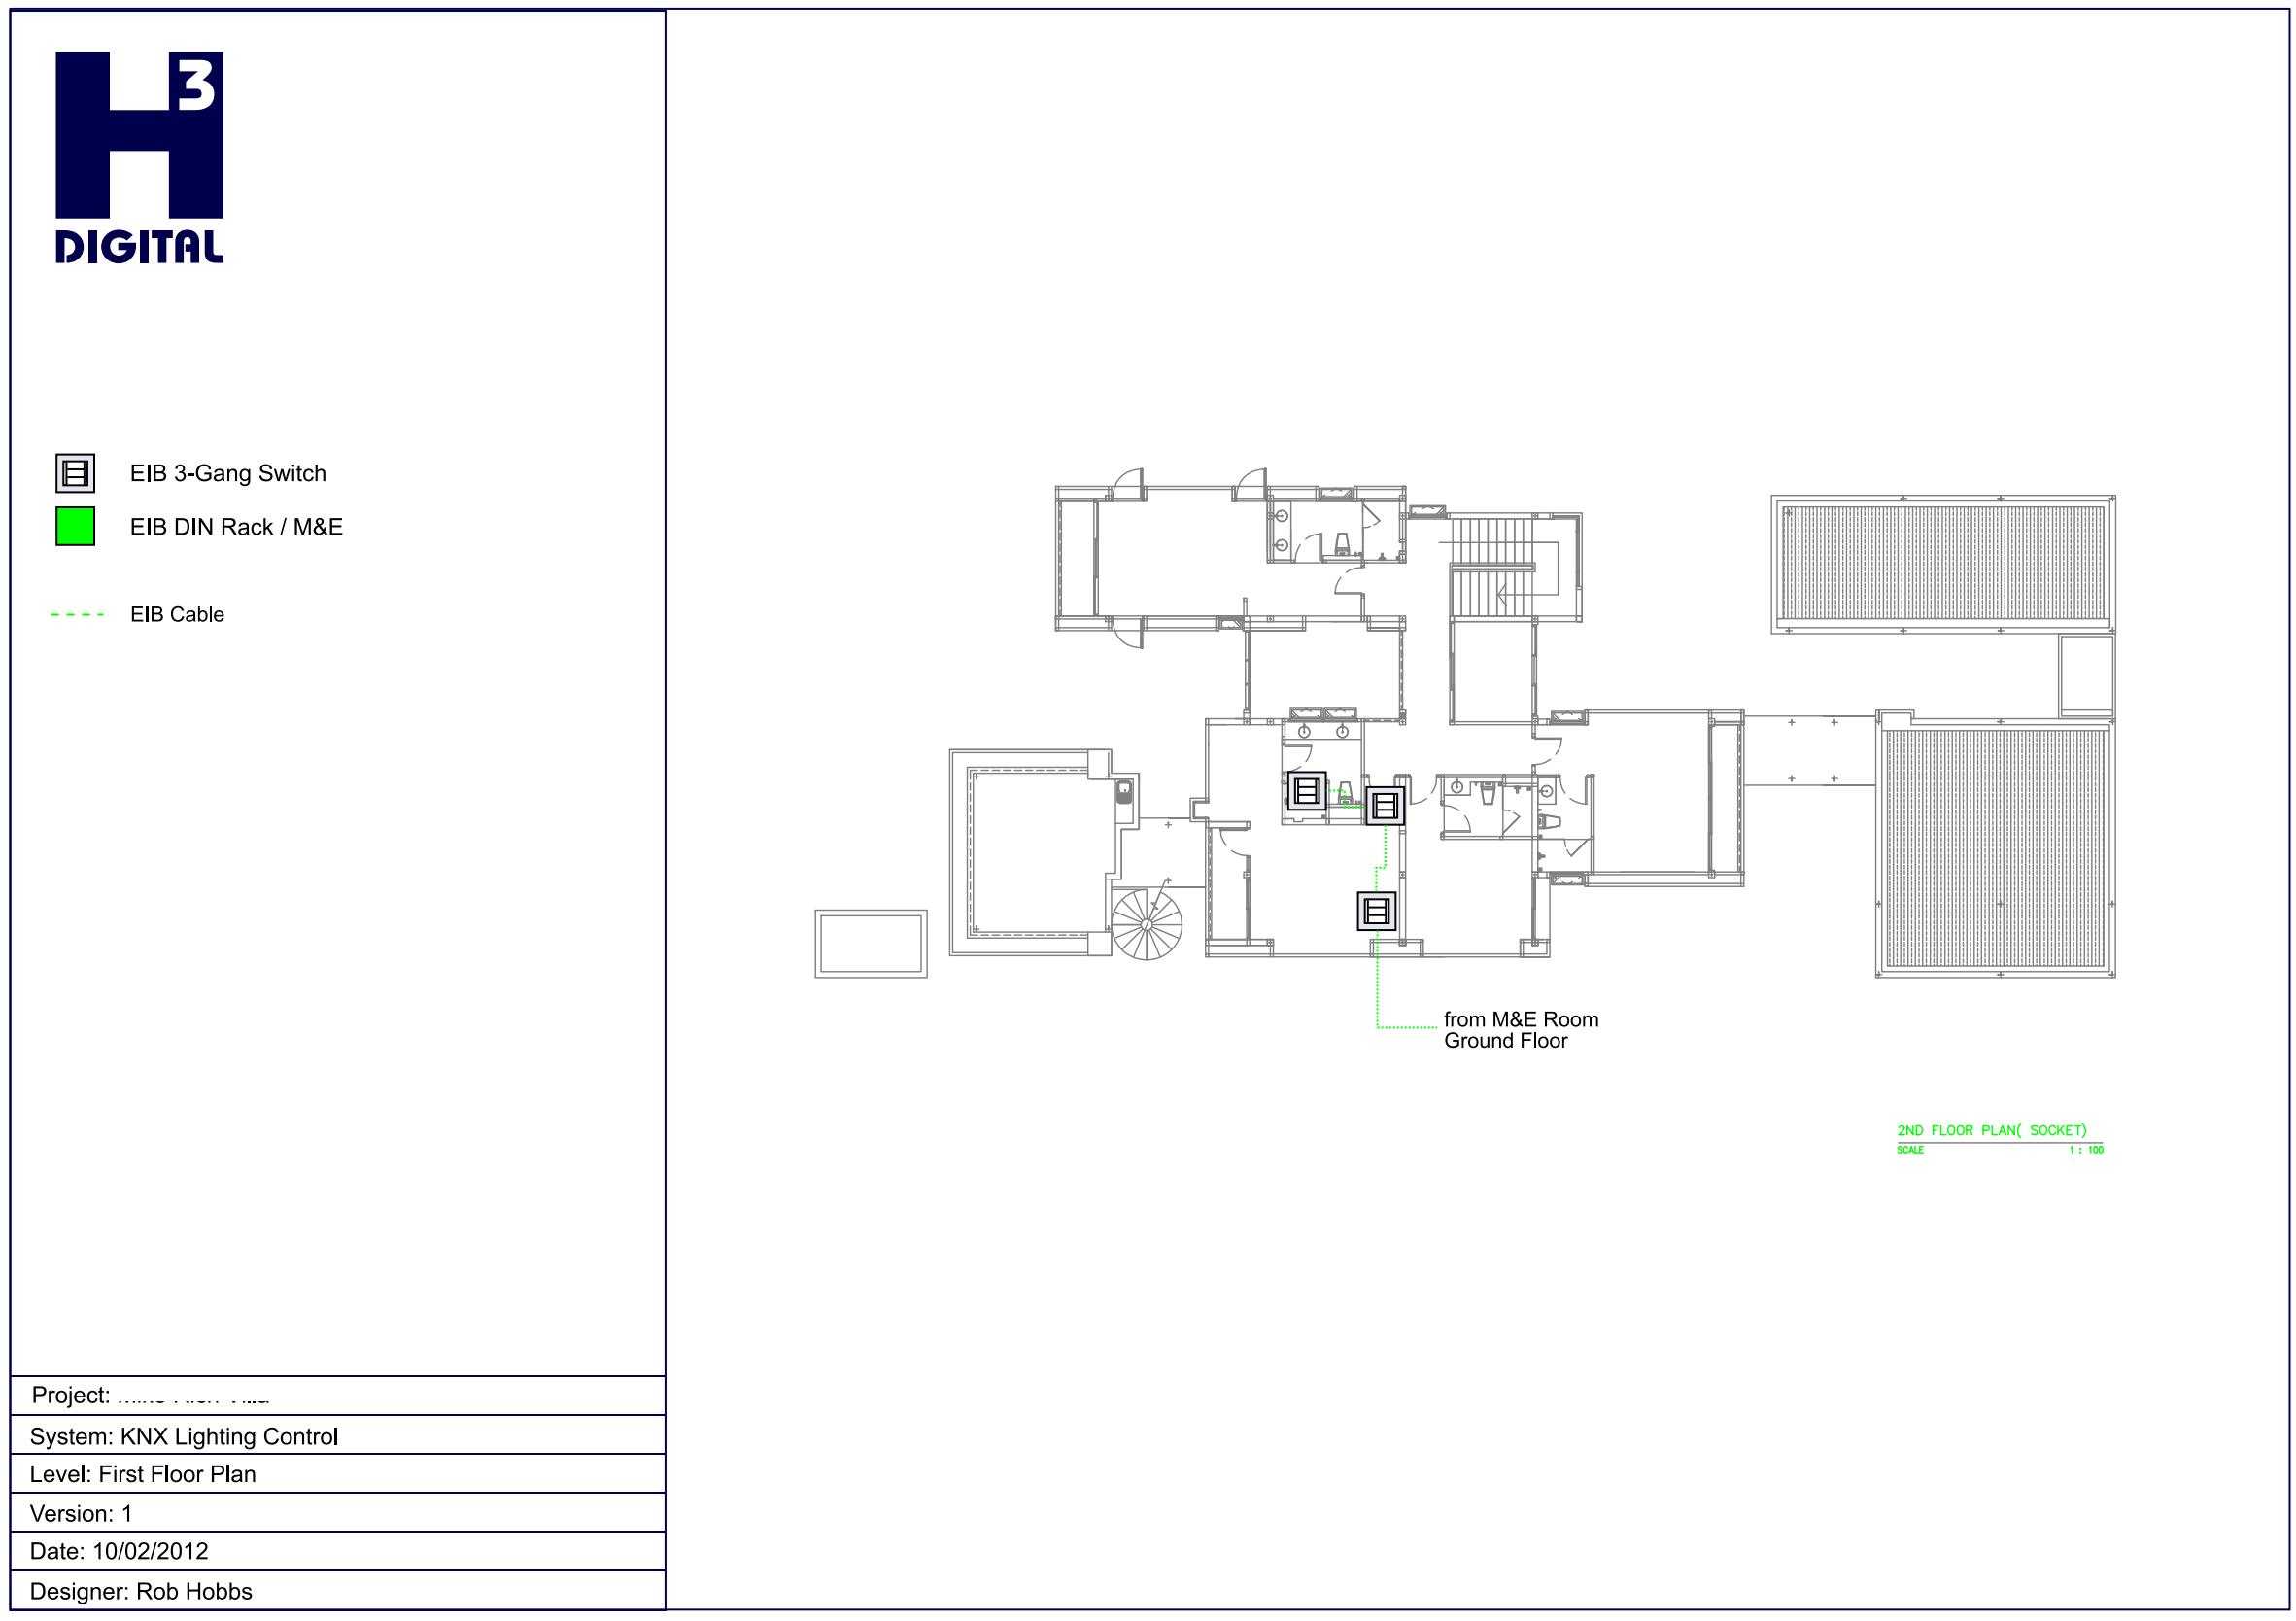 Example - Common Area Lighting control - Upper Level